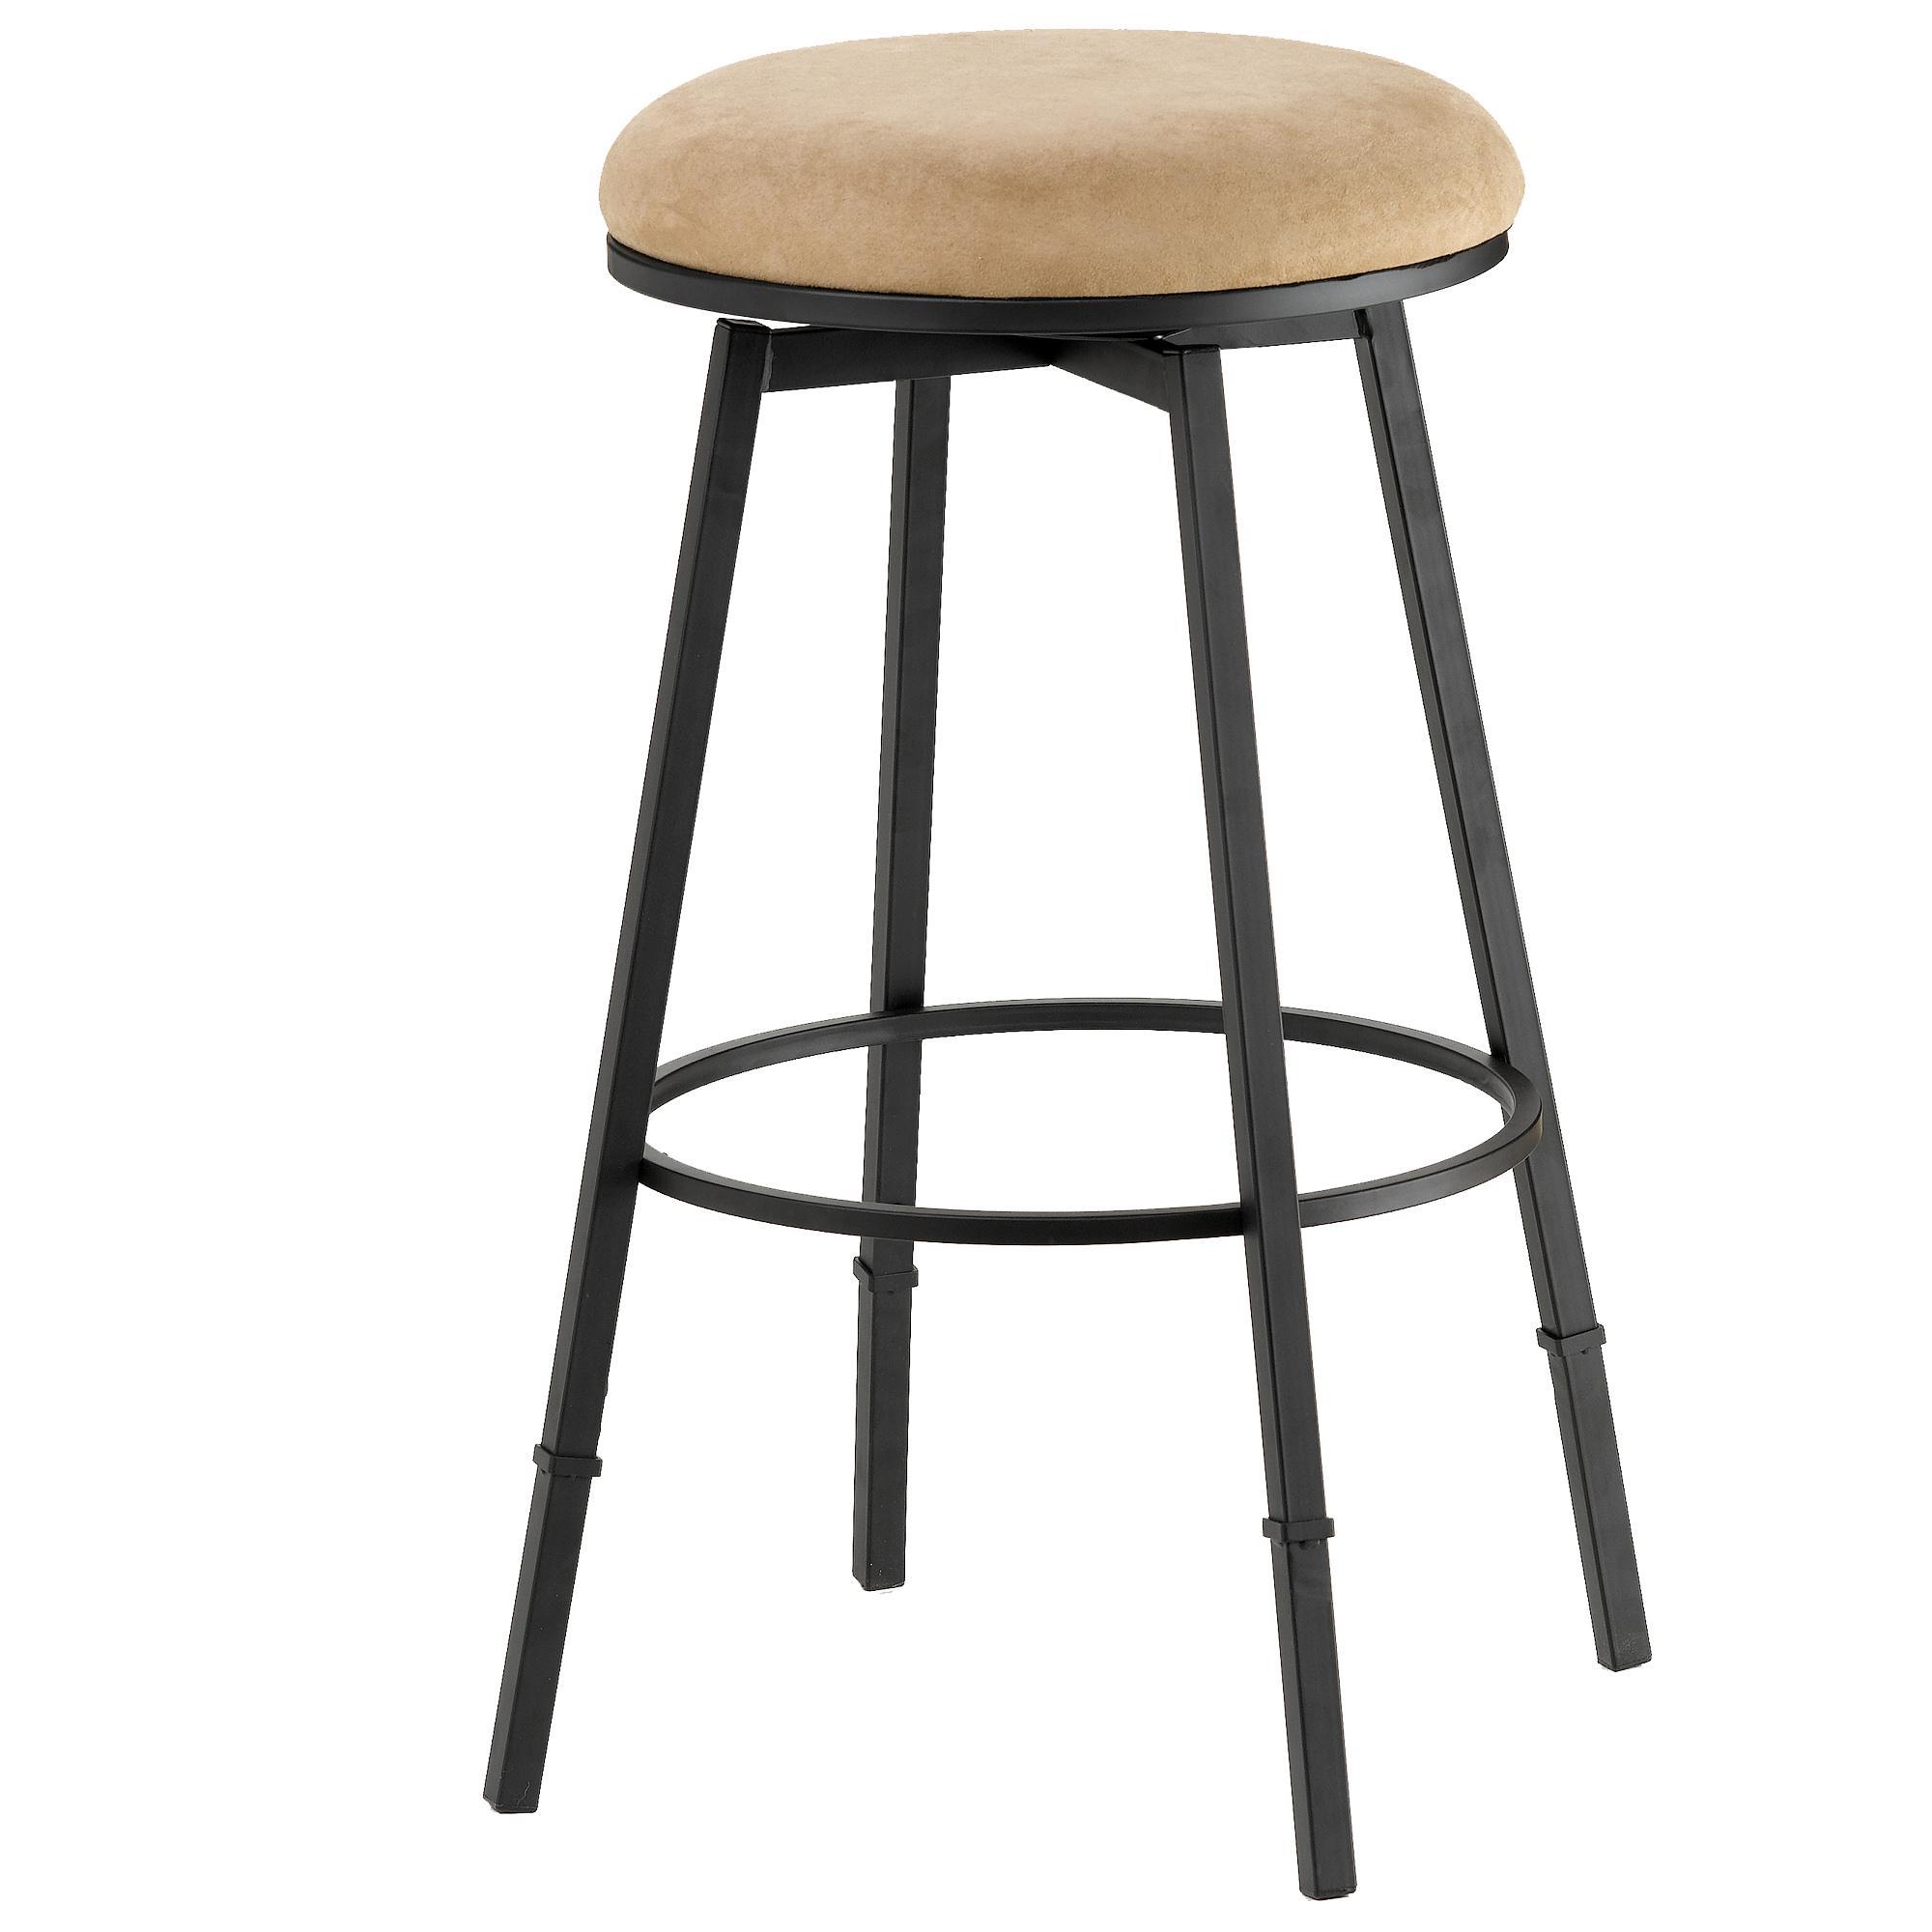 Backless Bar Stools Sanders Adjustable Backless Bar Stool at Ruby Gordon Home